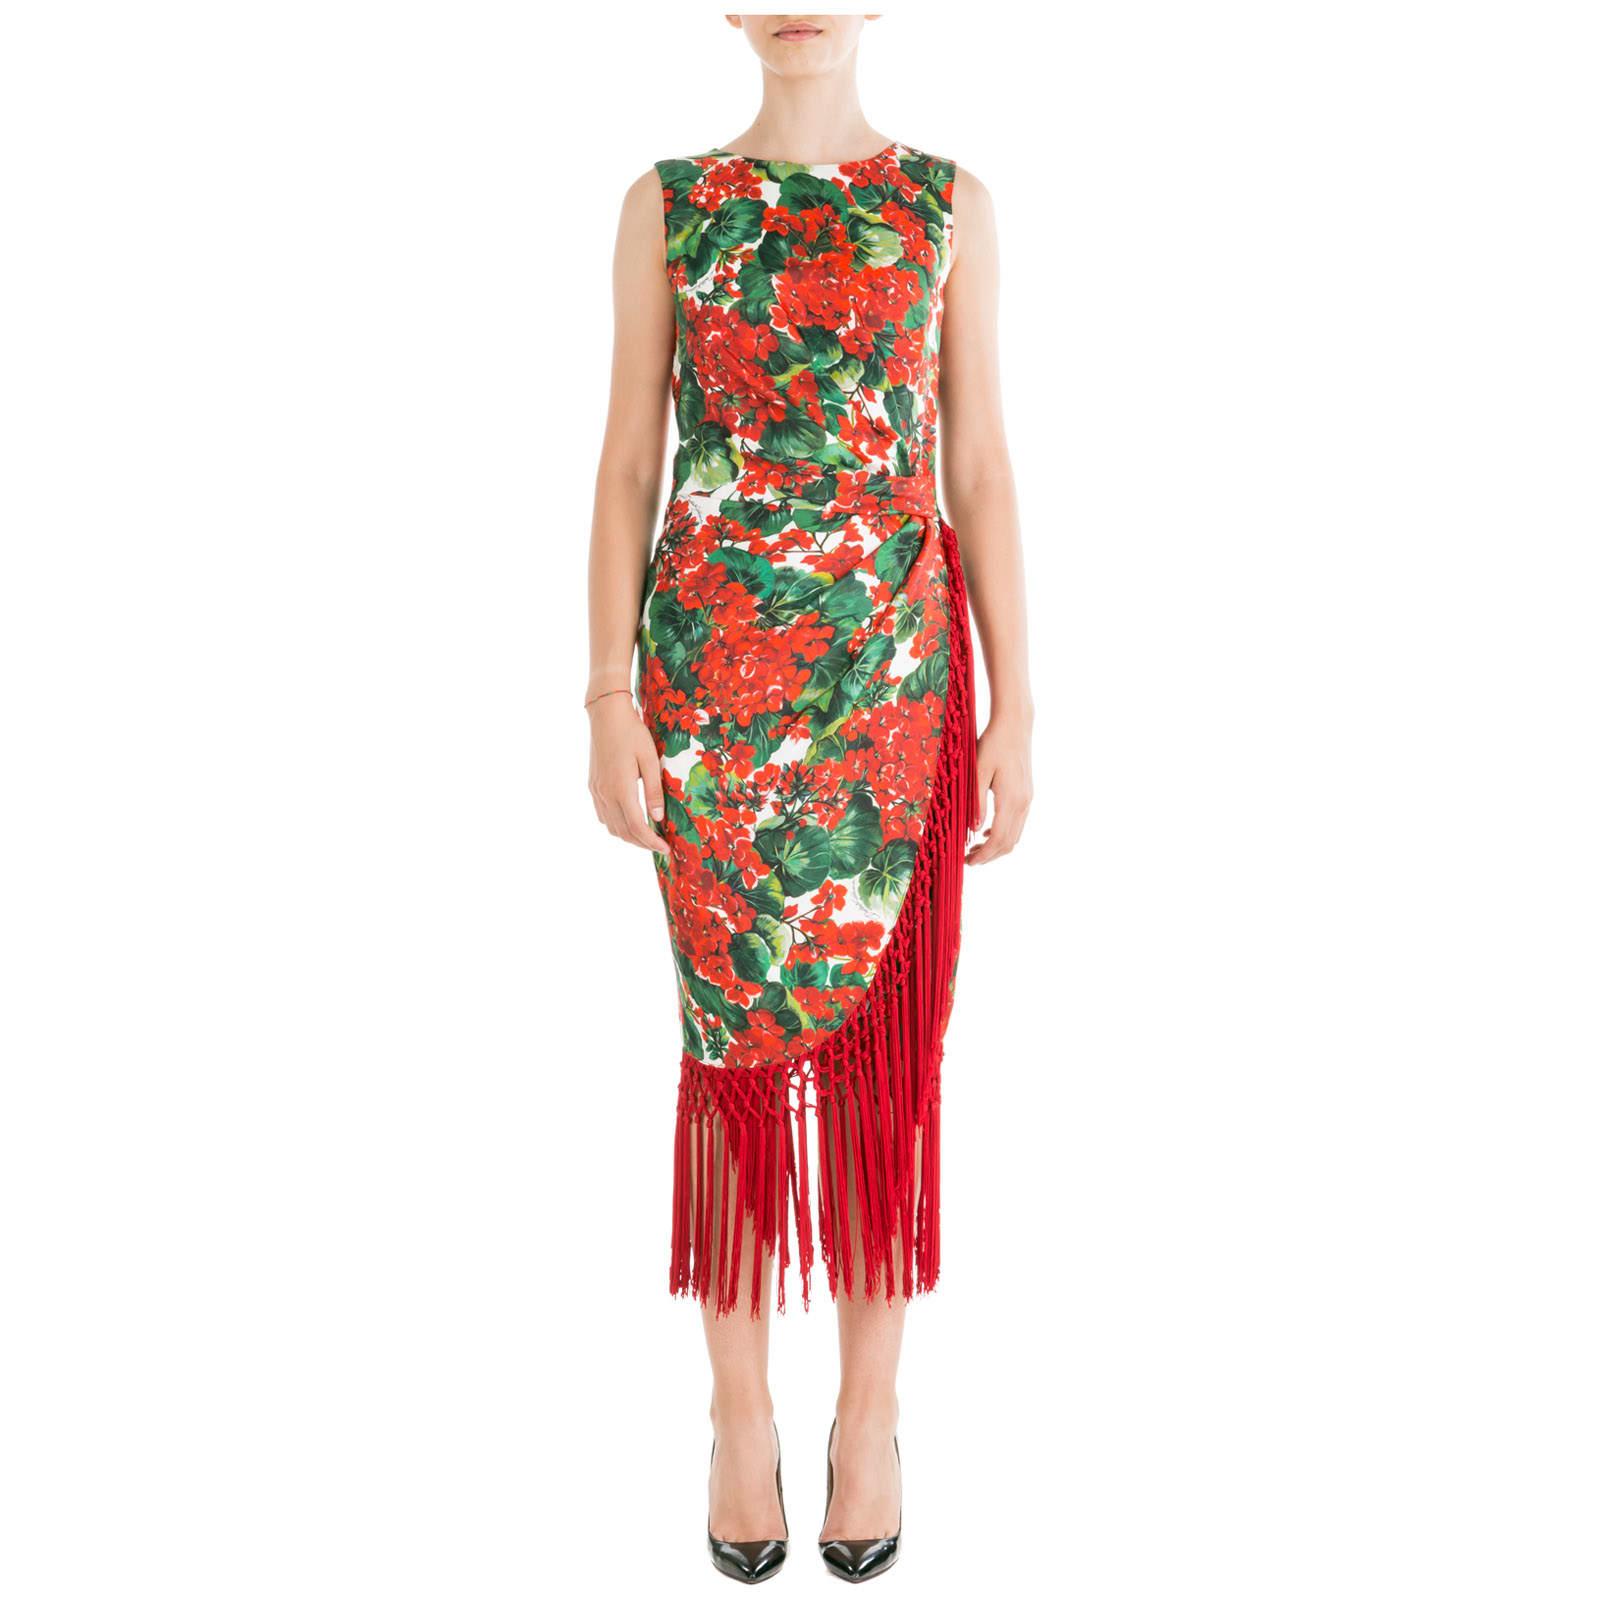 Dolce & Gabbana Knee Length Dress Sleeveless